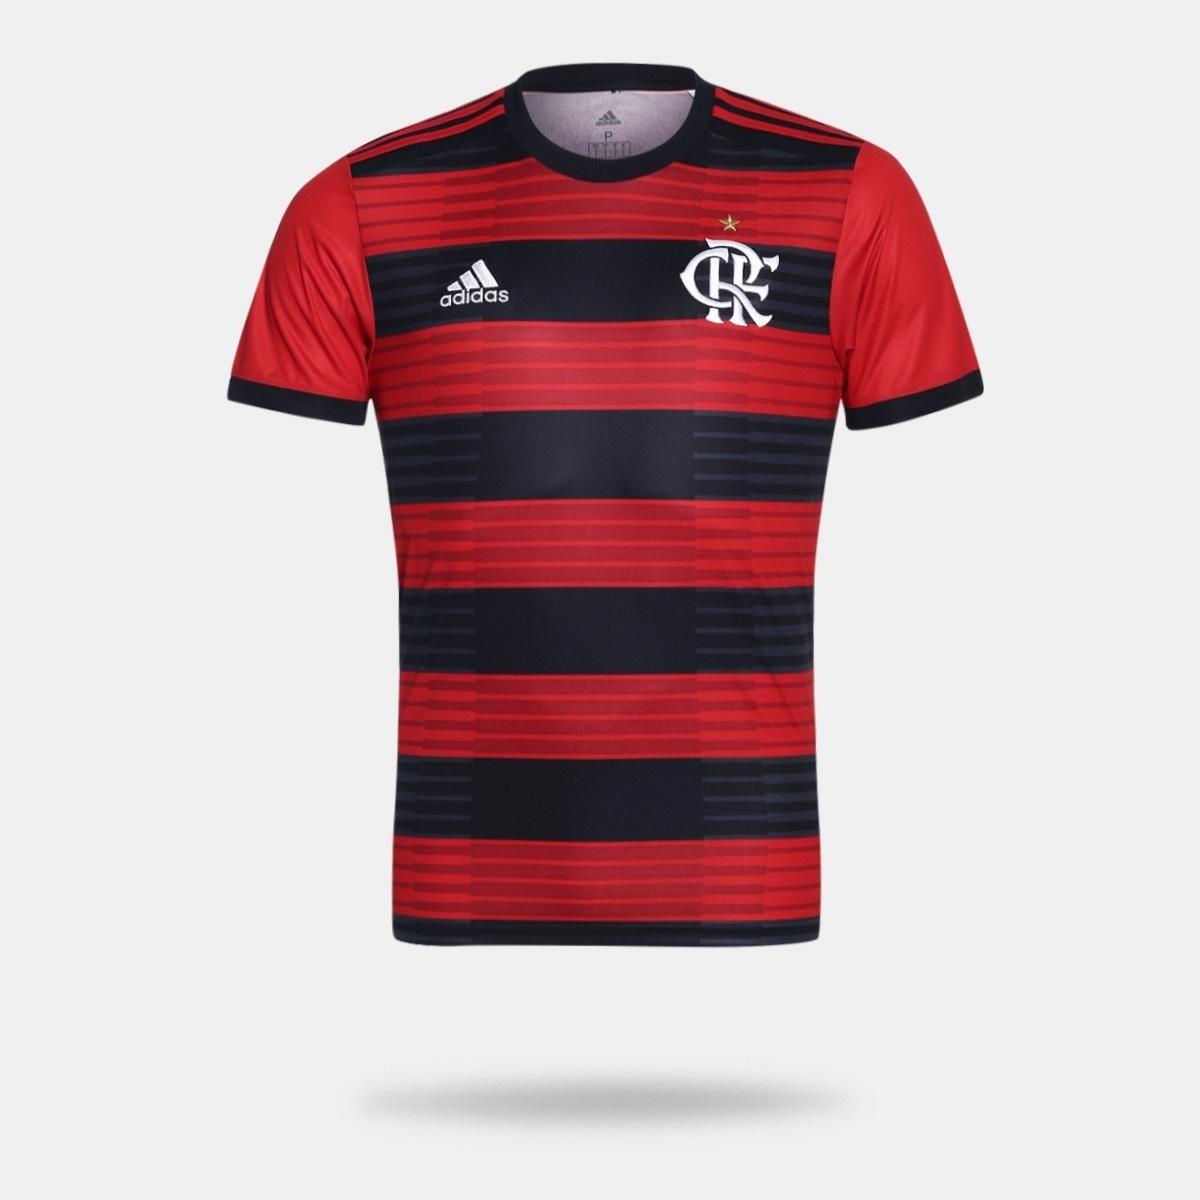 camisa flamengo oficial adidas pronta entrega 2019. Carregando zoom. e4cead25dfc37